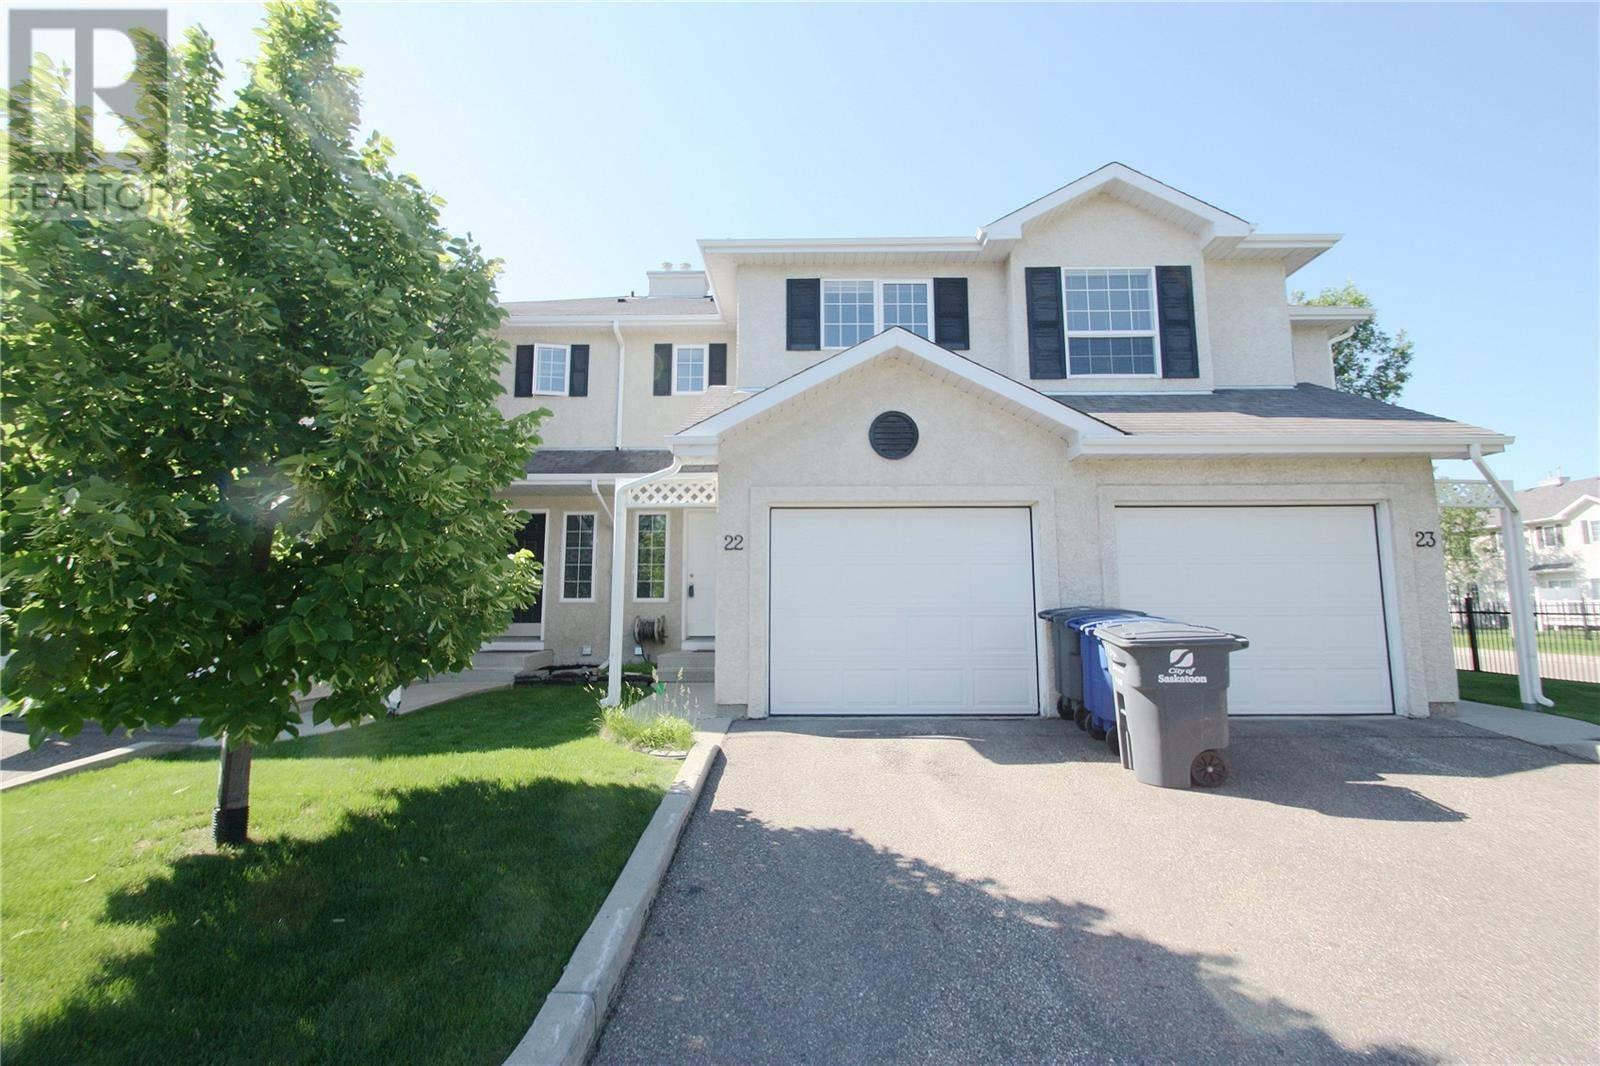 Townhouse for sale at 138 Banyan Cres Unit 22 Saskatoon Saskatchewan - MLS: SK778440